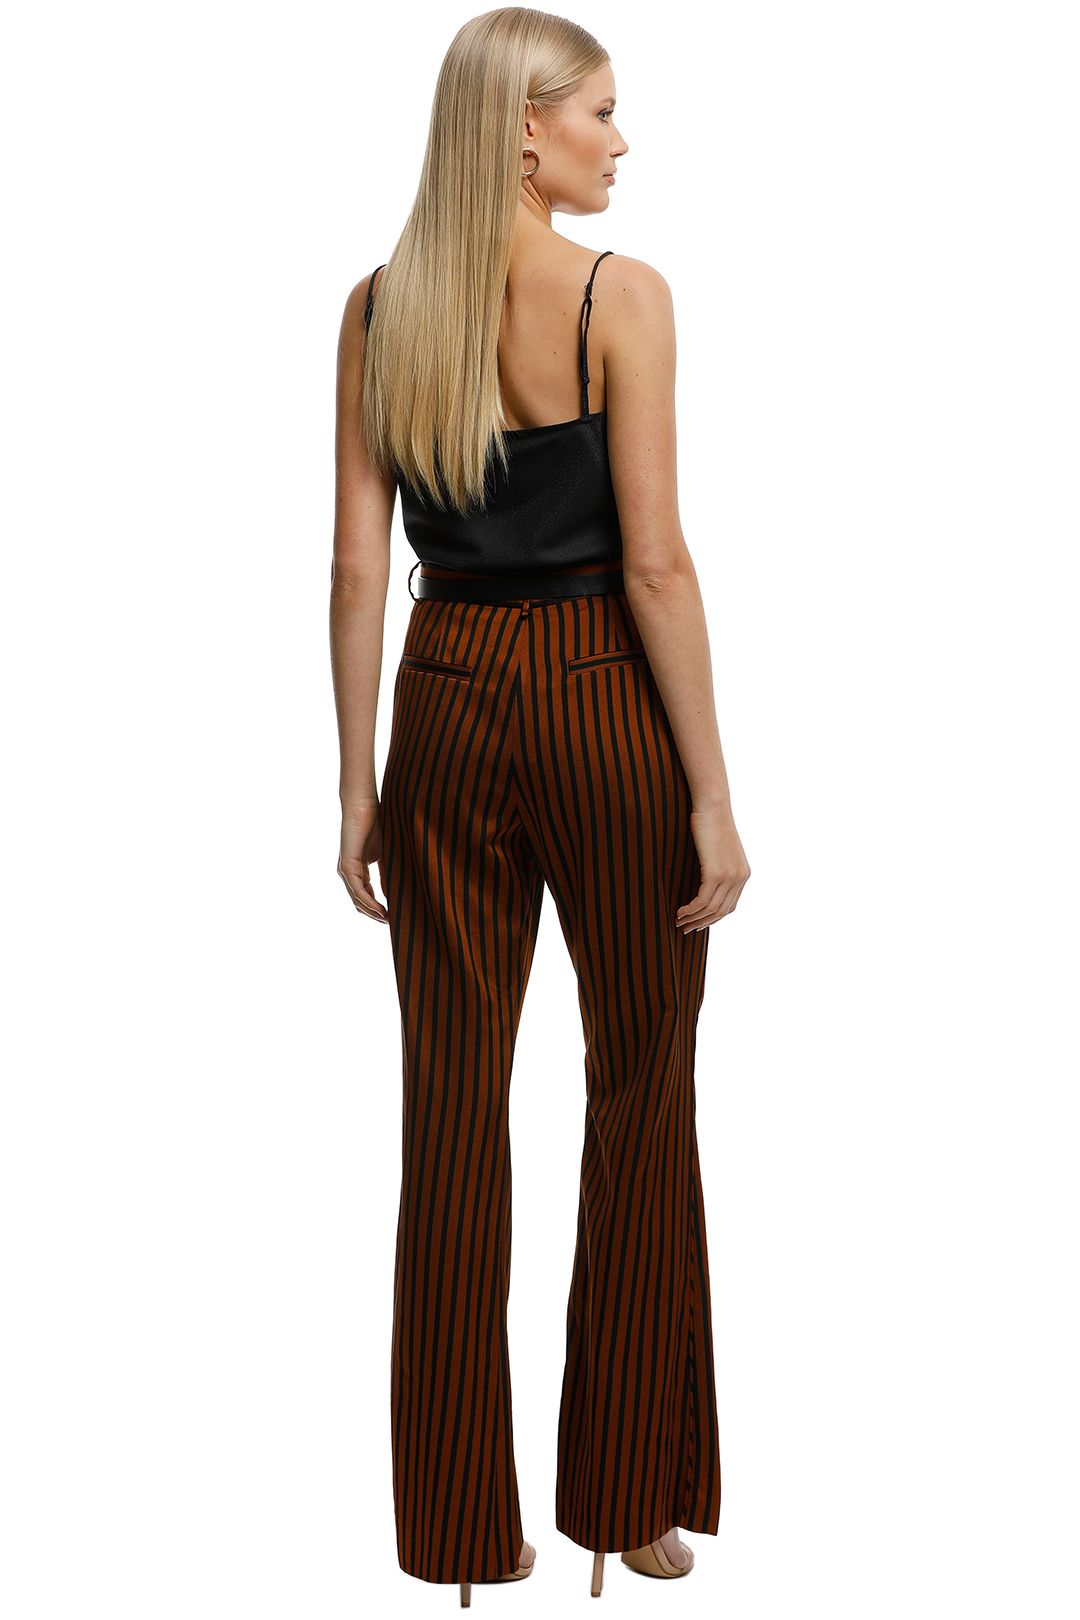 Lover-Liberation-Stripe-Pant-Chestnut-Stripe-Back